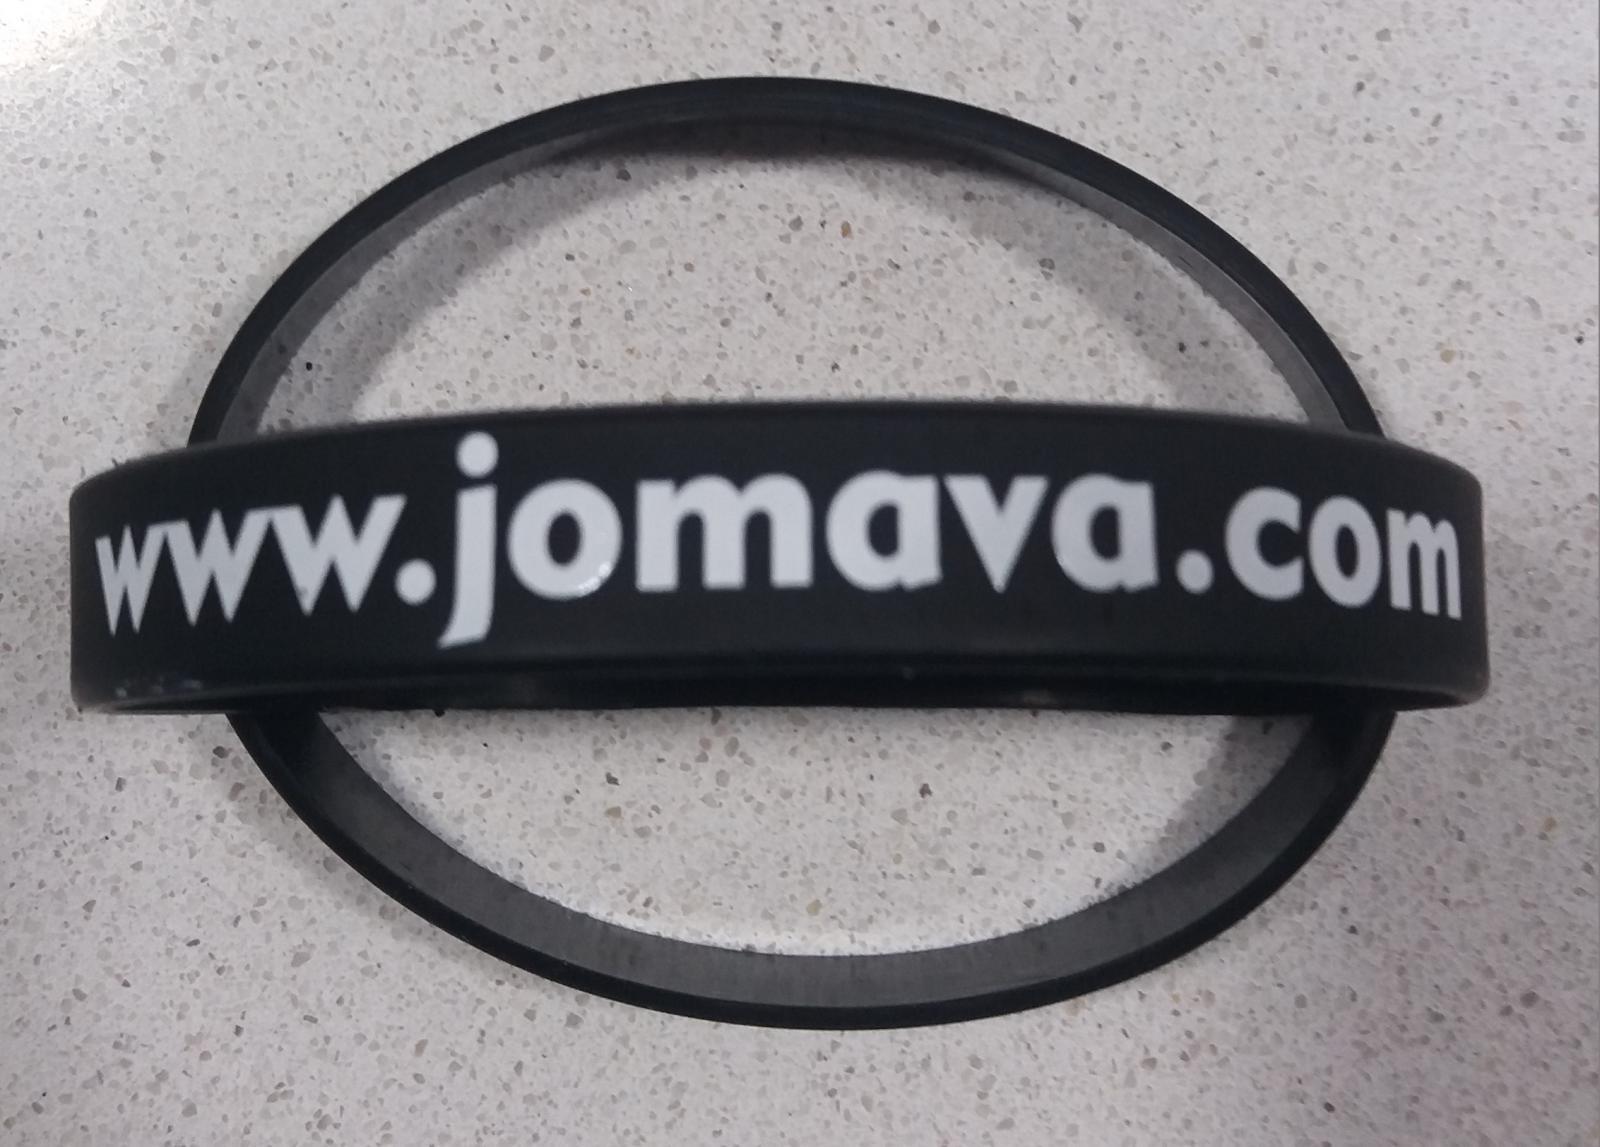 Pulsera www.jomava.com - Consigue tu camiseta gratis